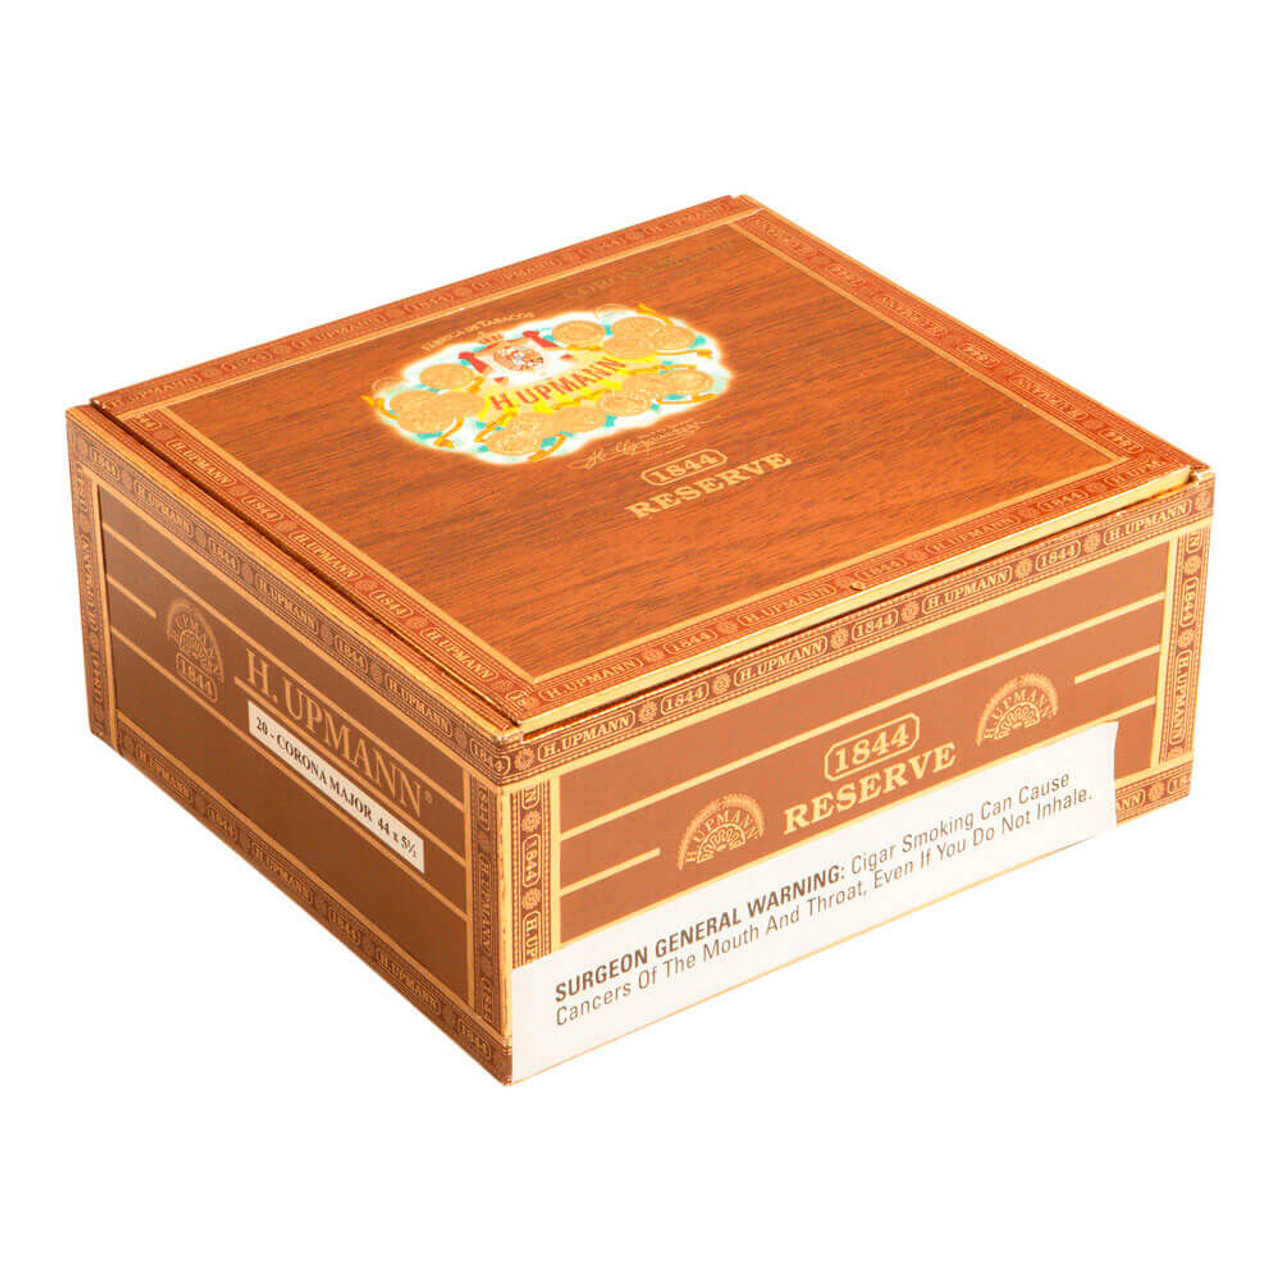 H. Upmann 1844 Reserve Corona Major EMS Cigars - 5.5 x 44 (Box of 21)